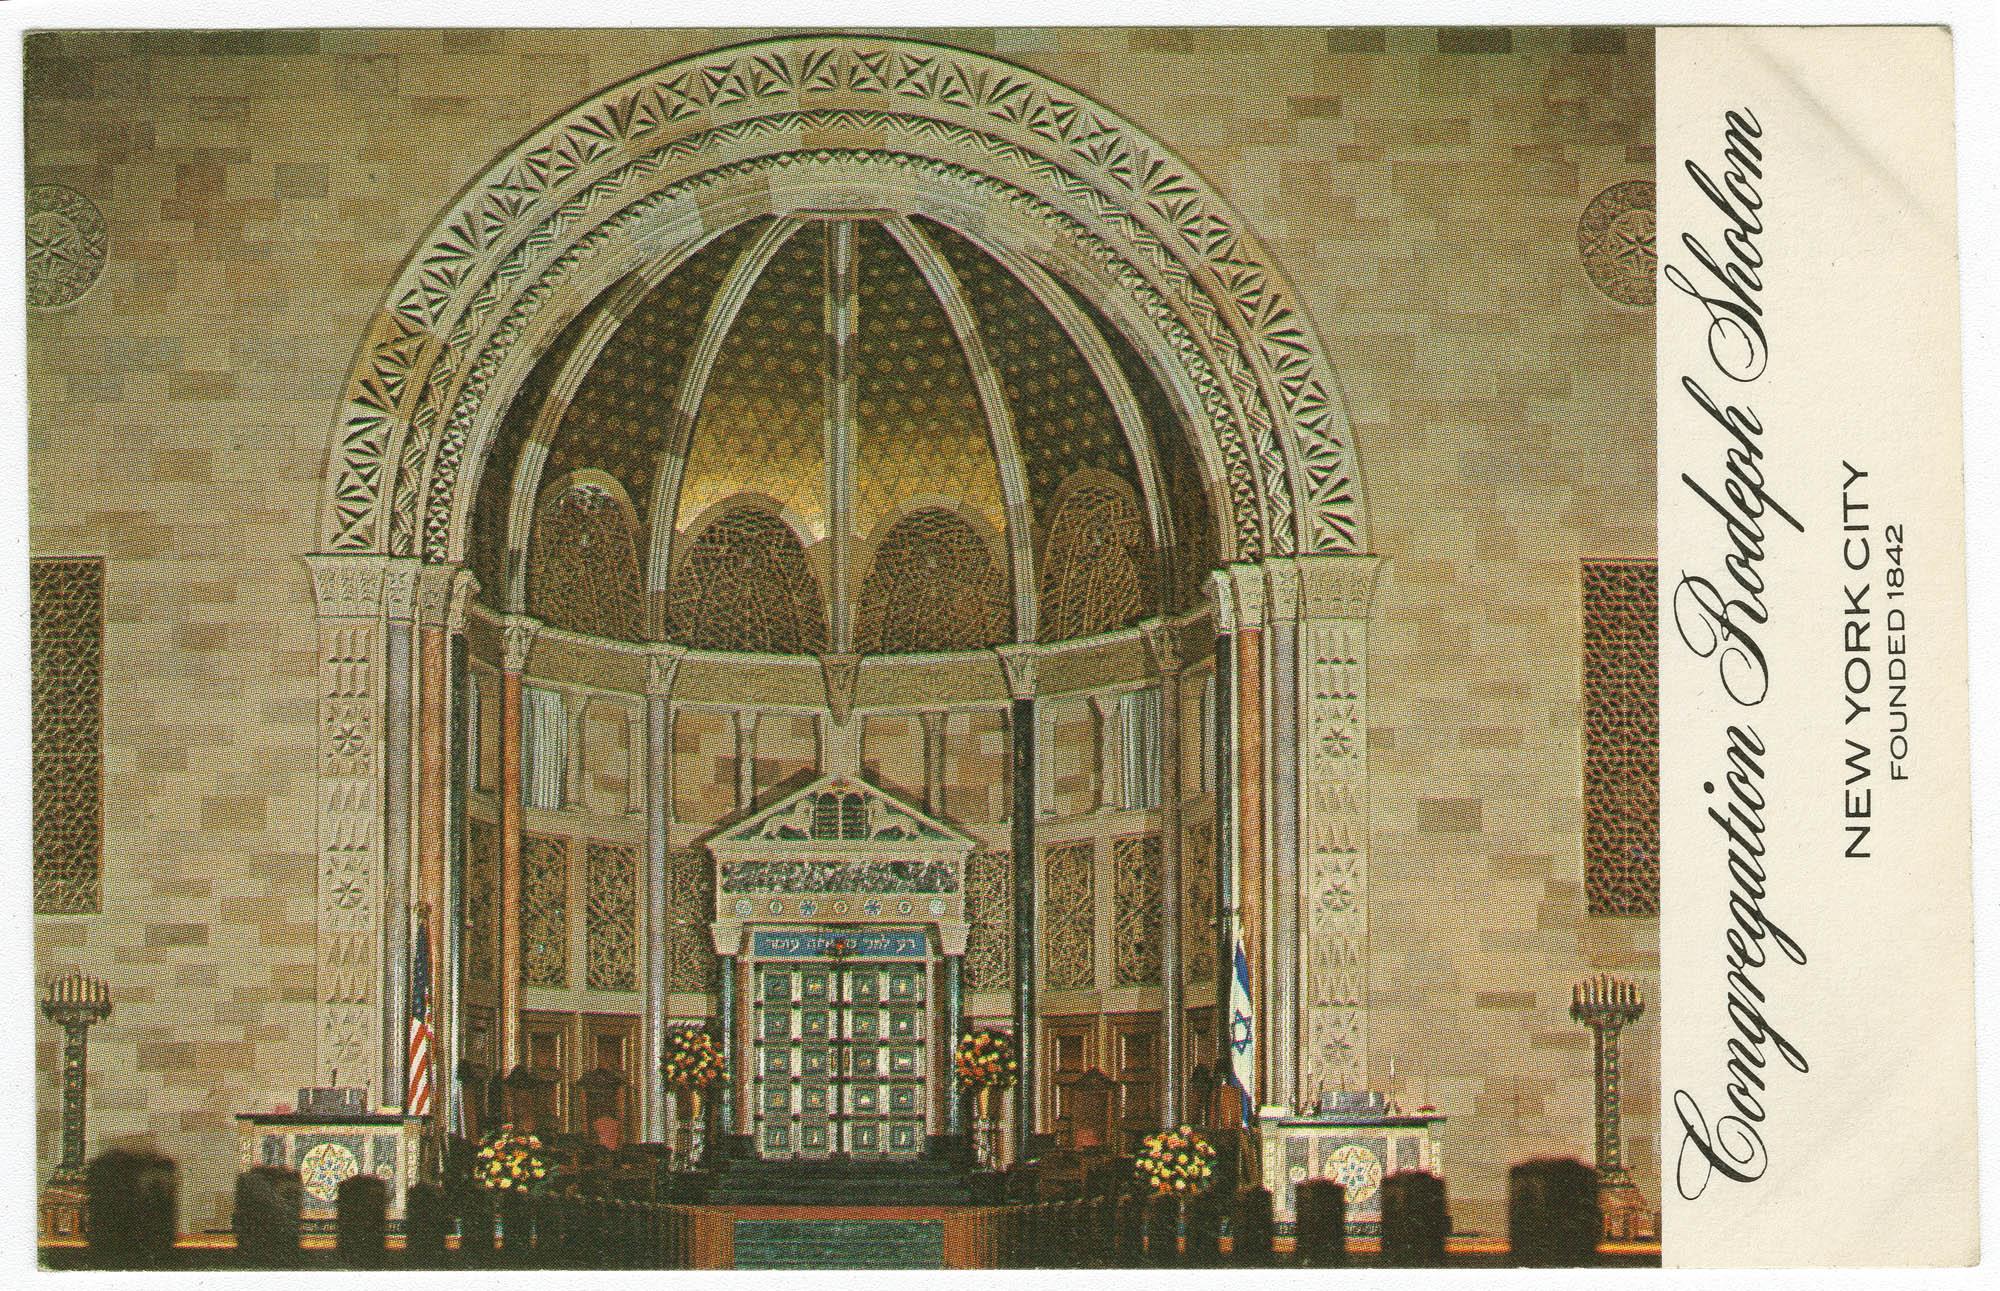 Congregation Rodeph Sholom, New York City